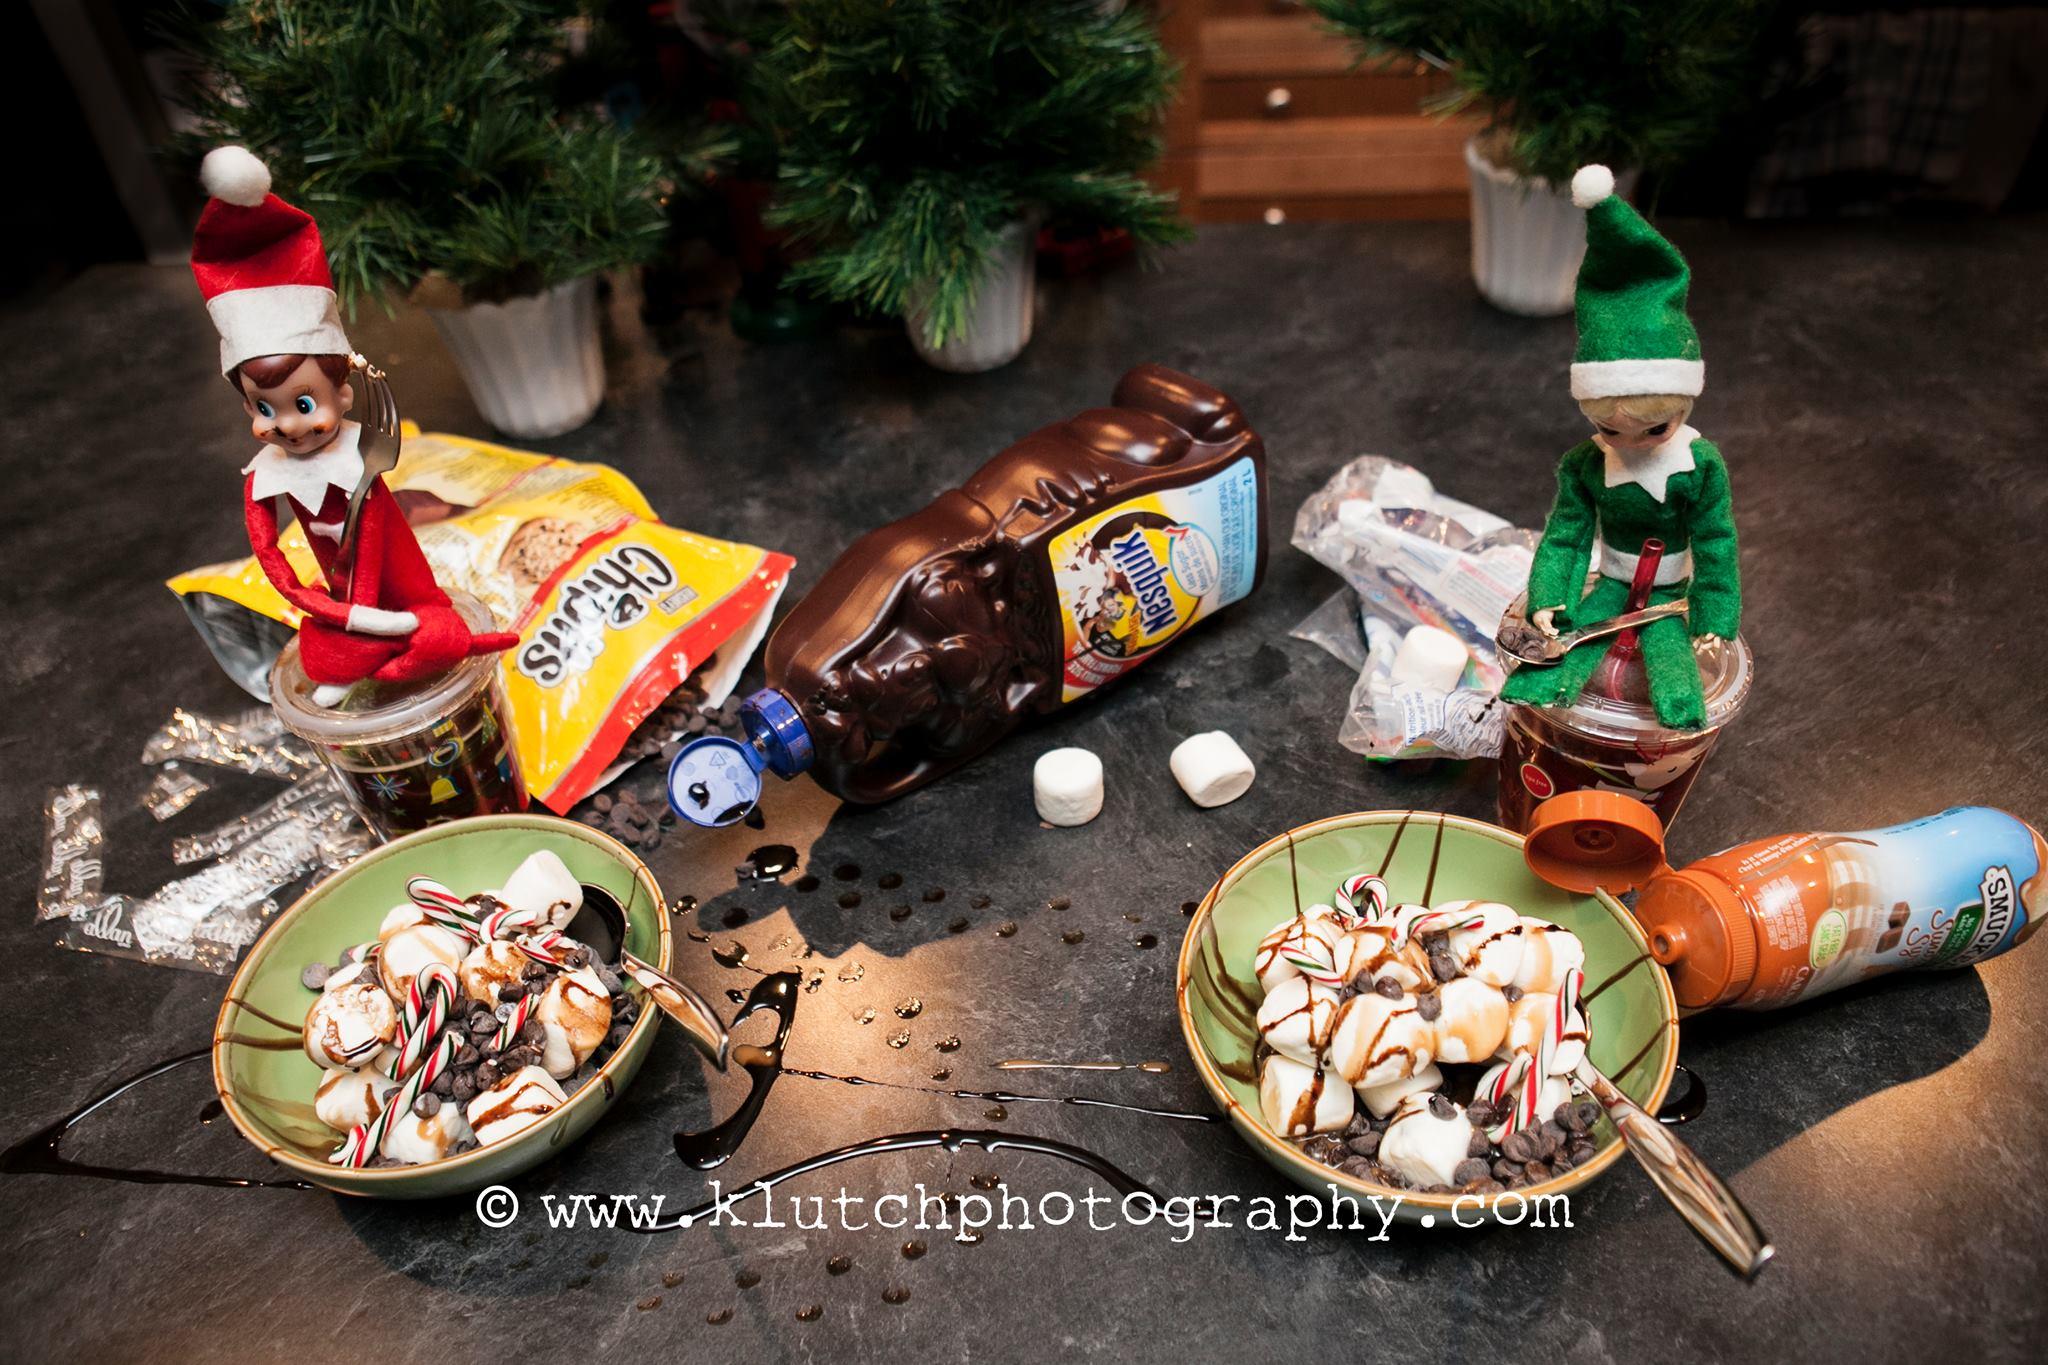 Klutch Photography, family photographer, elf on the shelf, vancouver family photographer, whiterock family photographer, lifeunscripted photographer, lifestlye photographer d.jpg